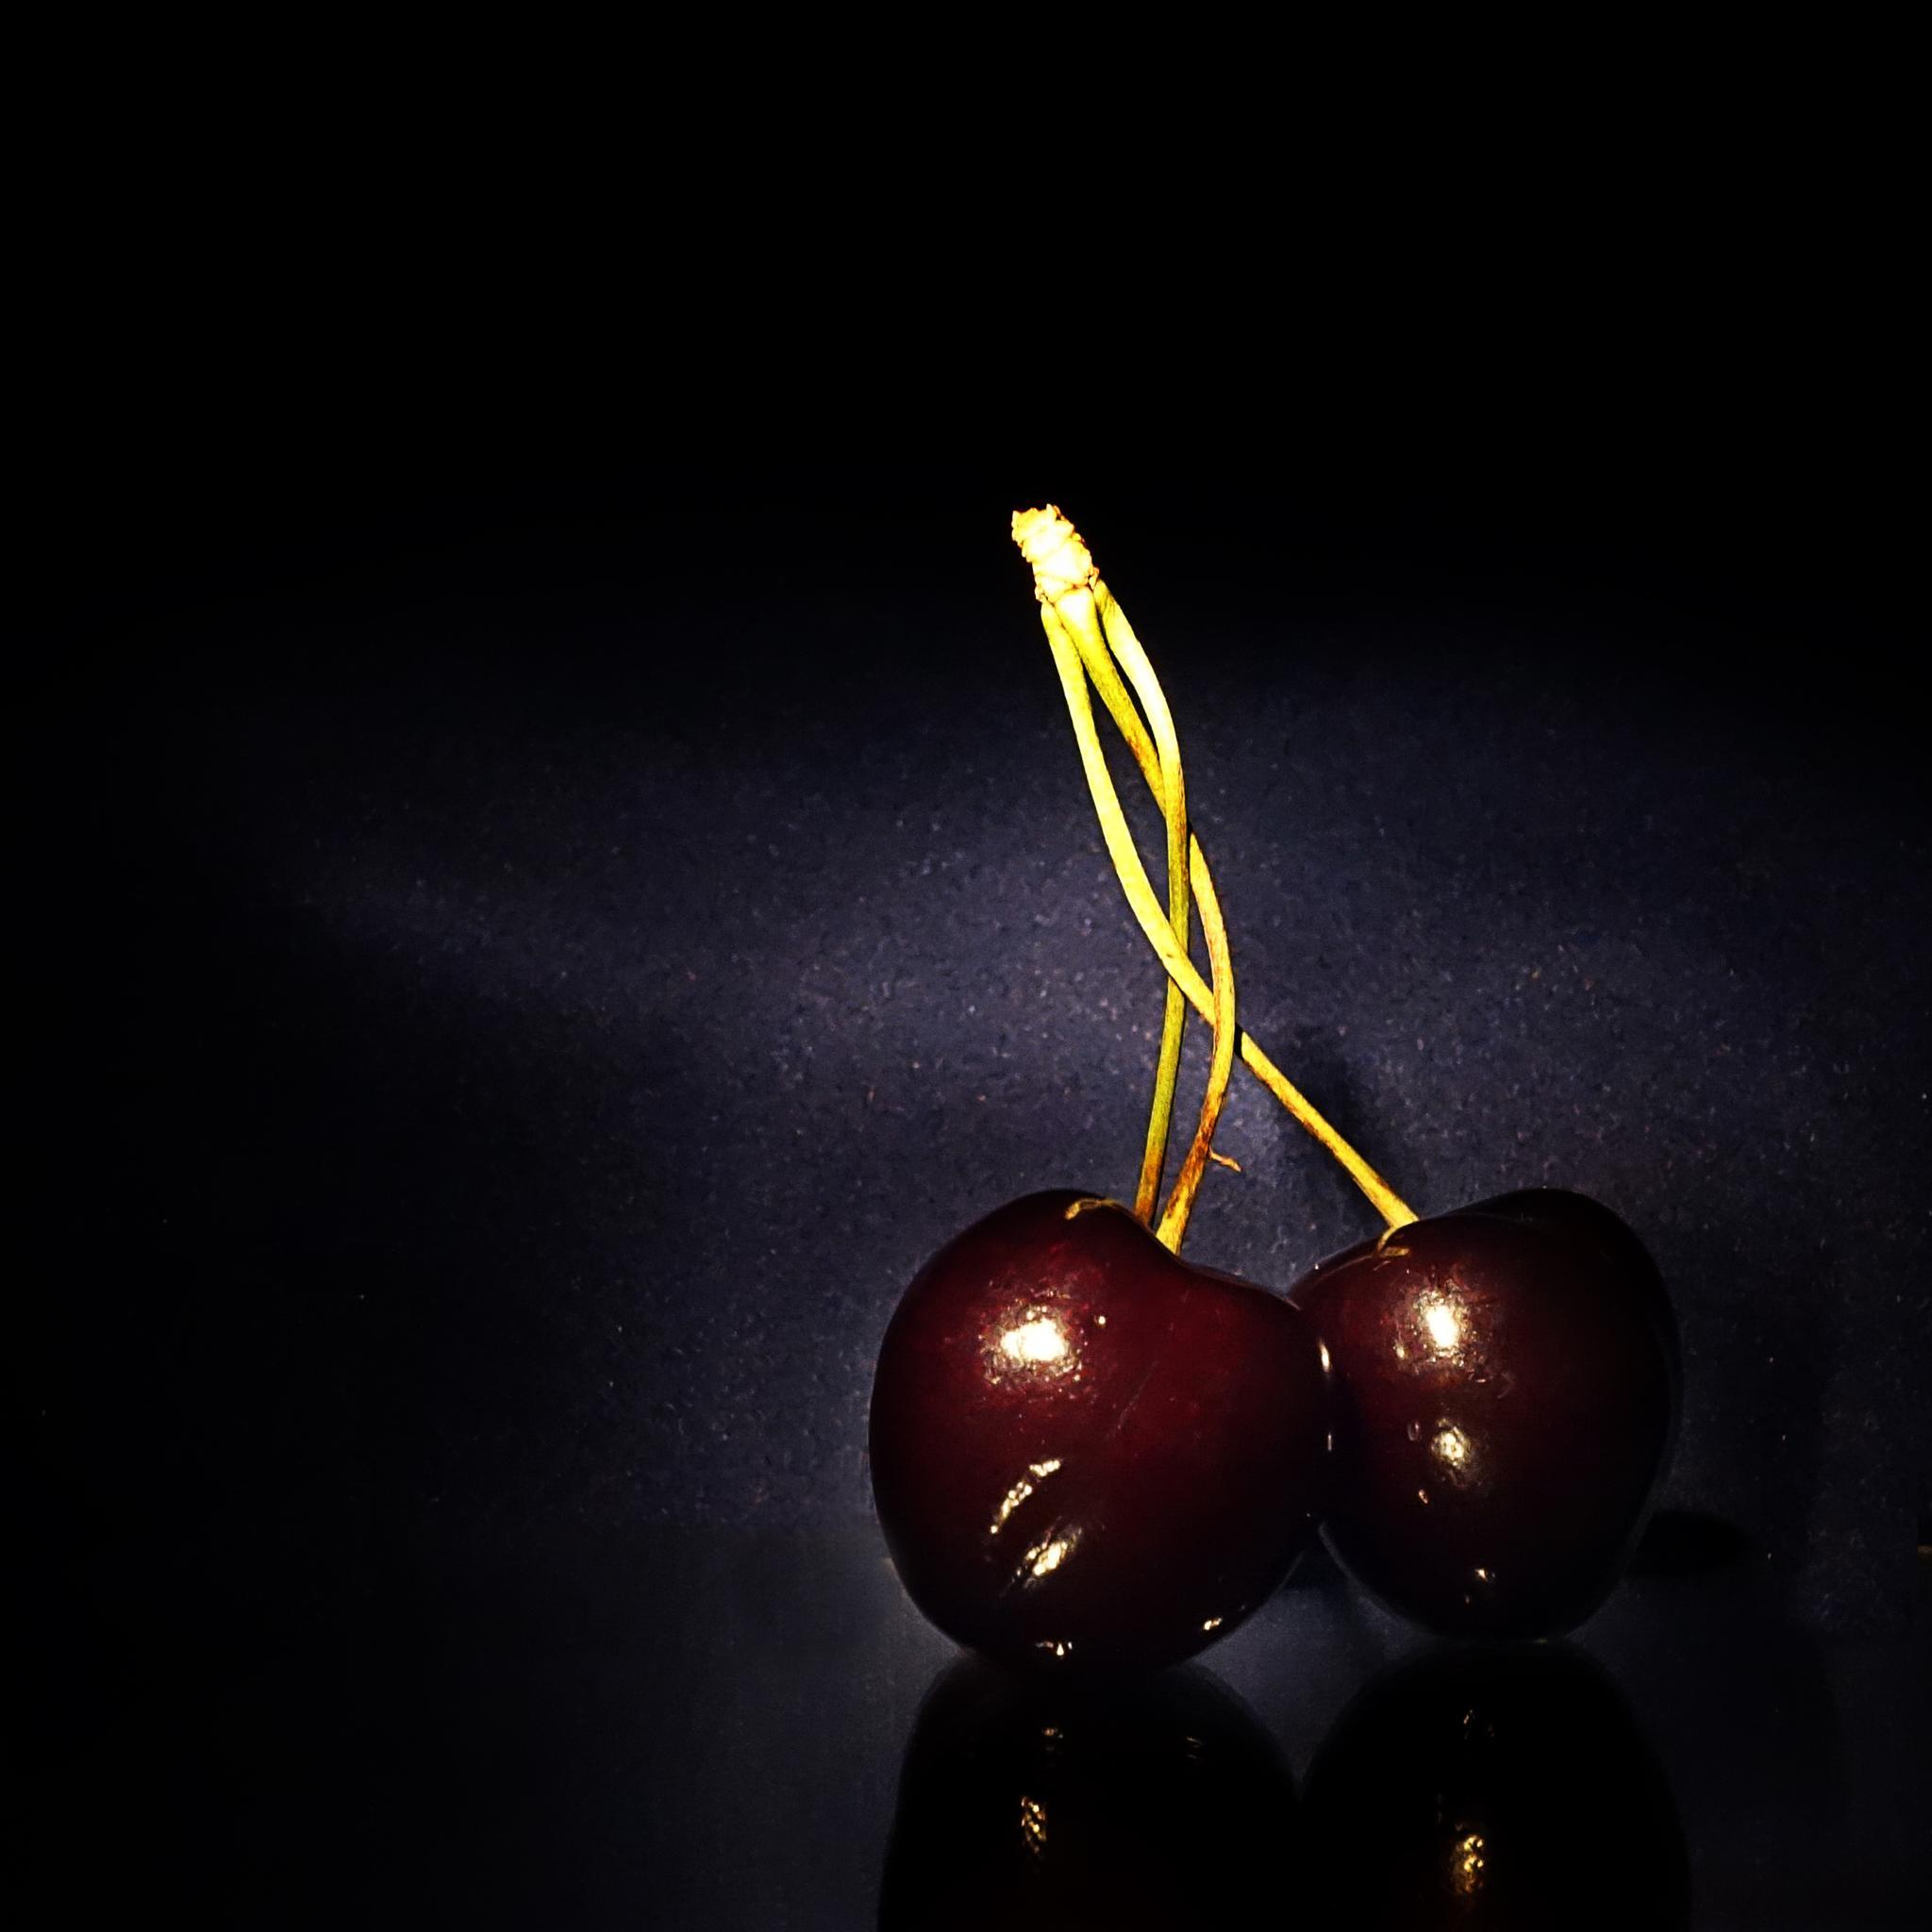 Cherries 3 by Ad Spruijt